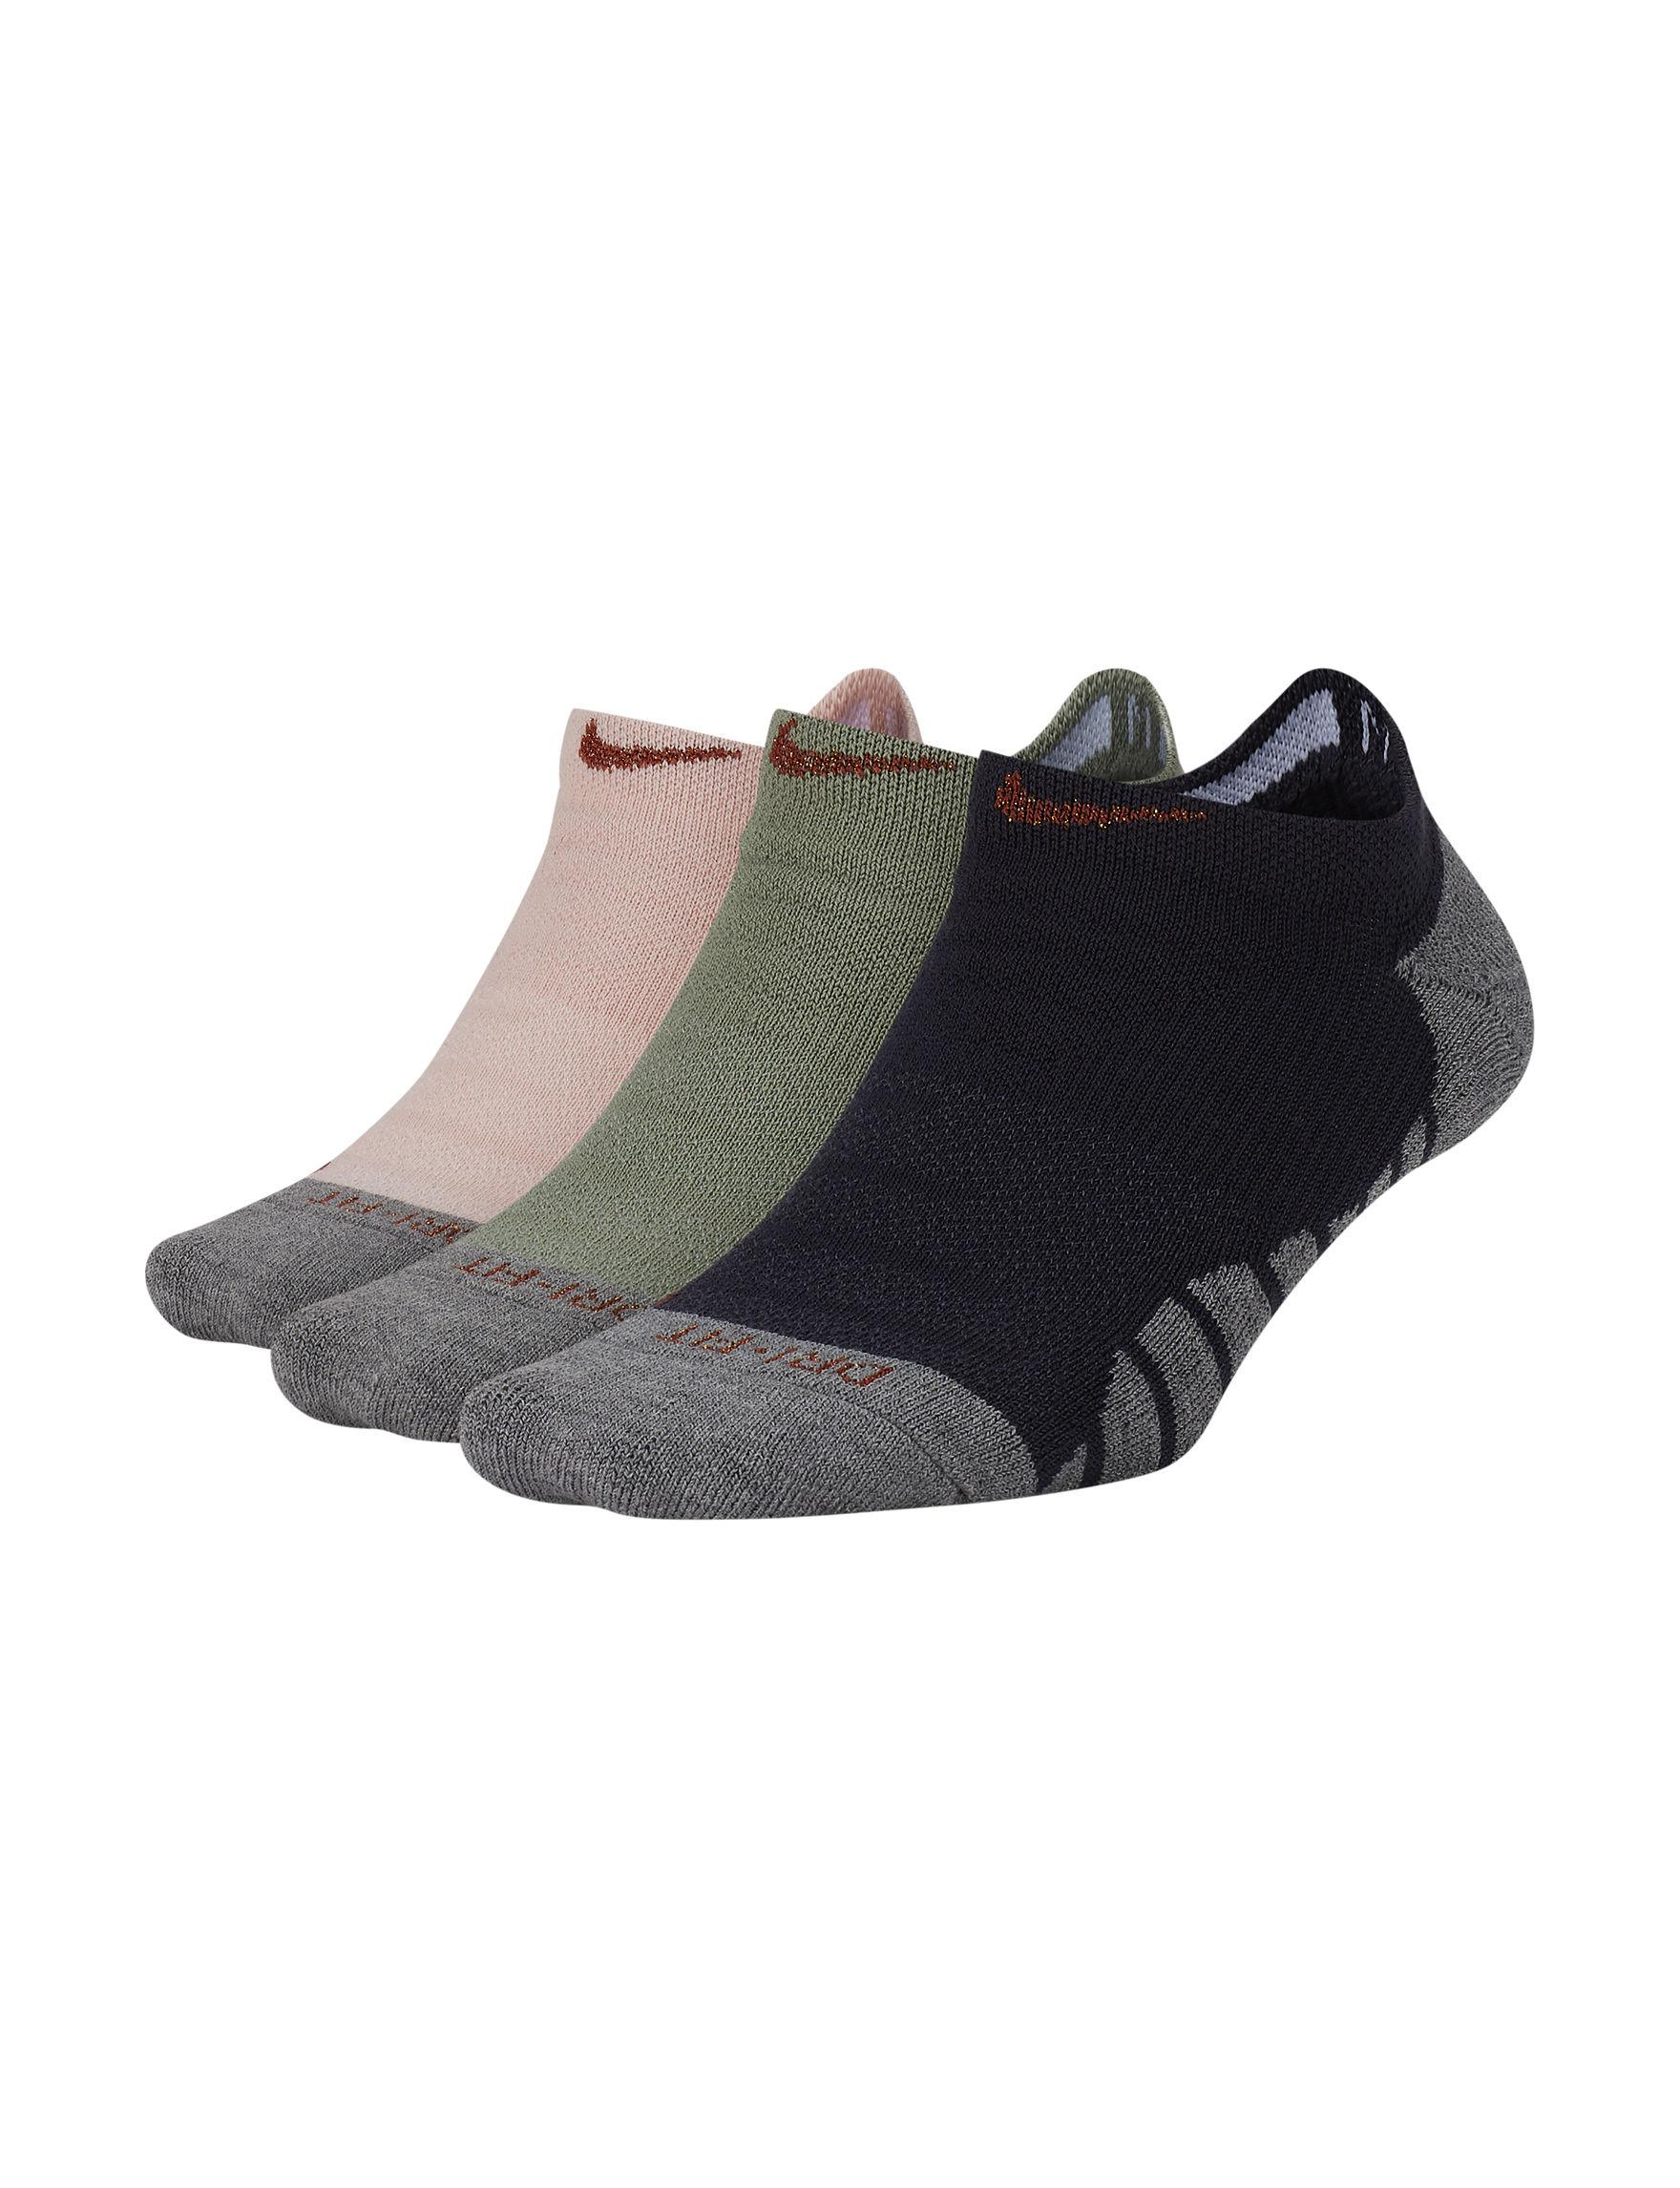 Nike Grey Multi Socks